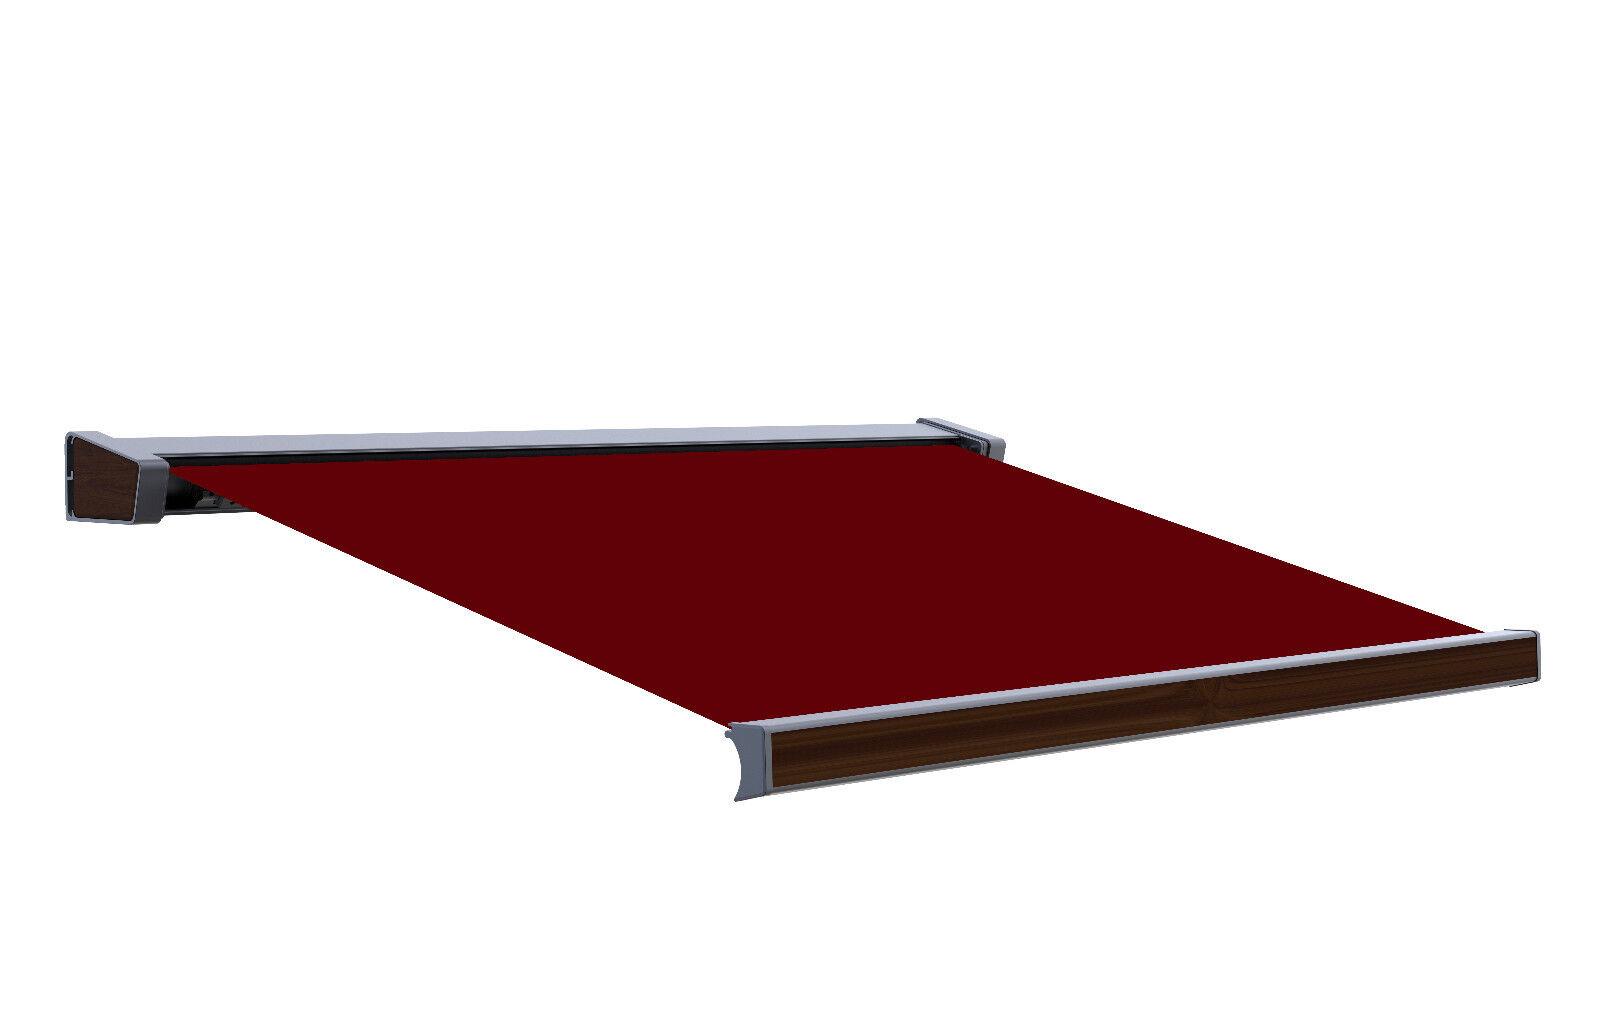 Markisenstoff sustituto de tela vollkassettenmarkise 5x3 m acrílico spd091